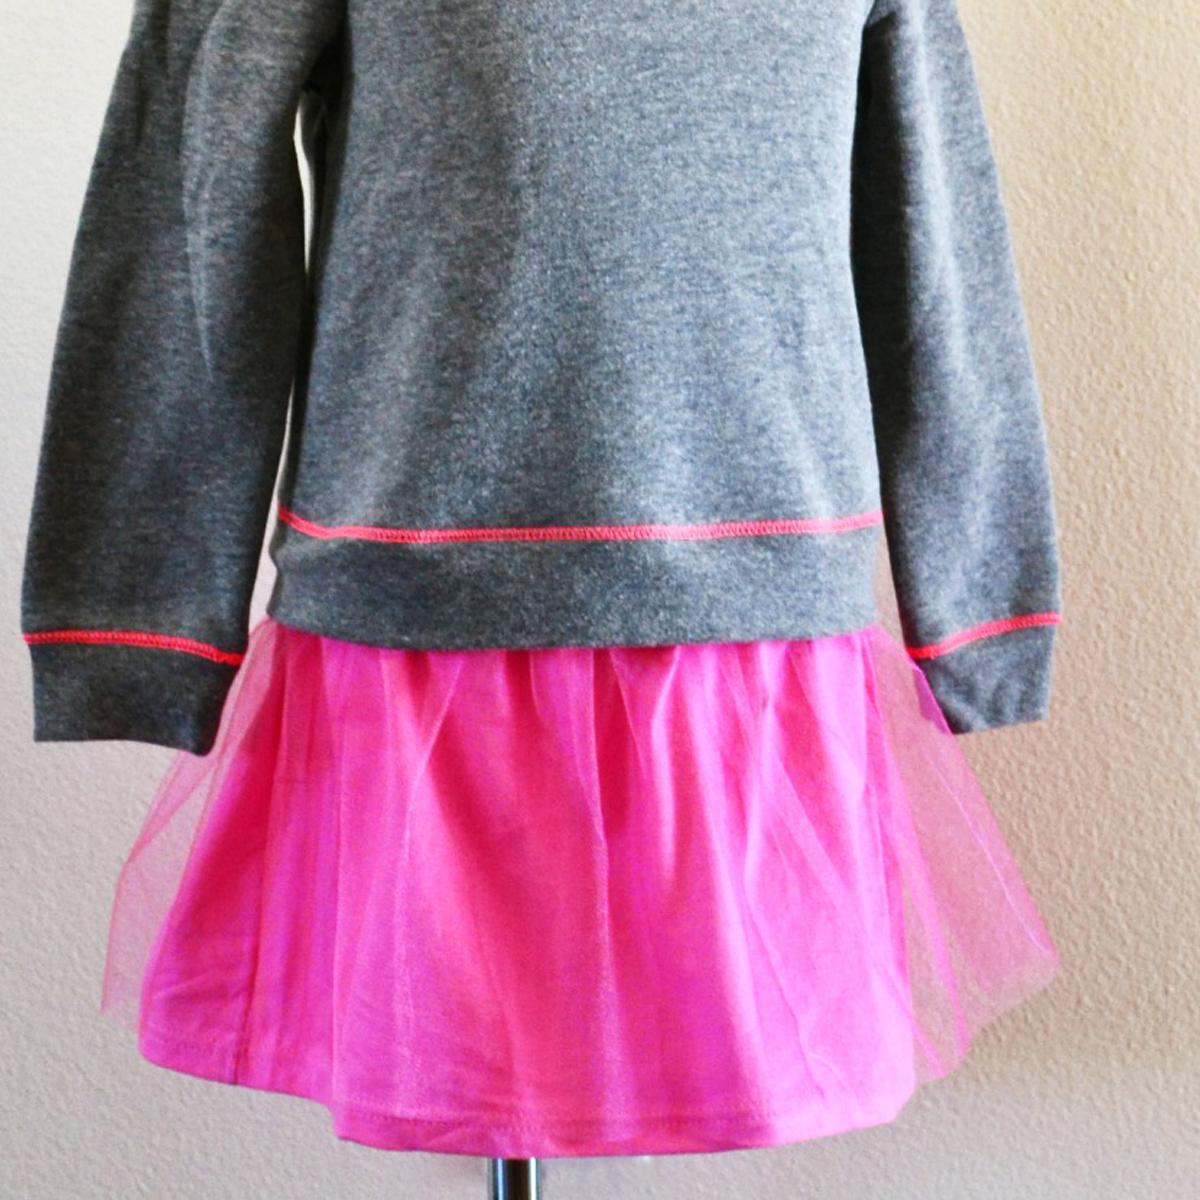 How to Turn a Sweatshirt into A Dress - Simple Simon and Company